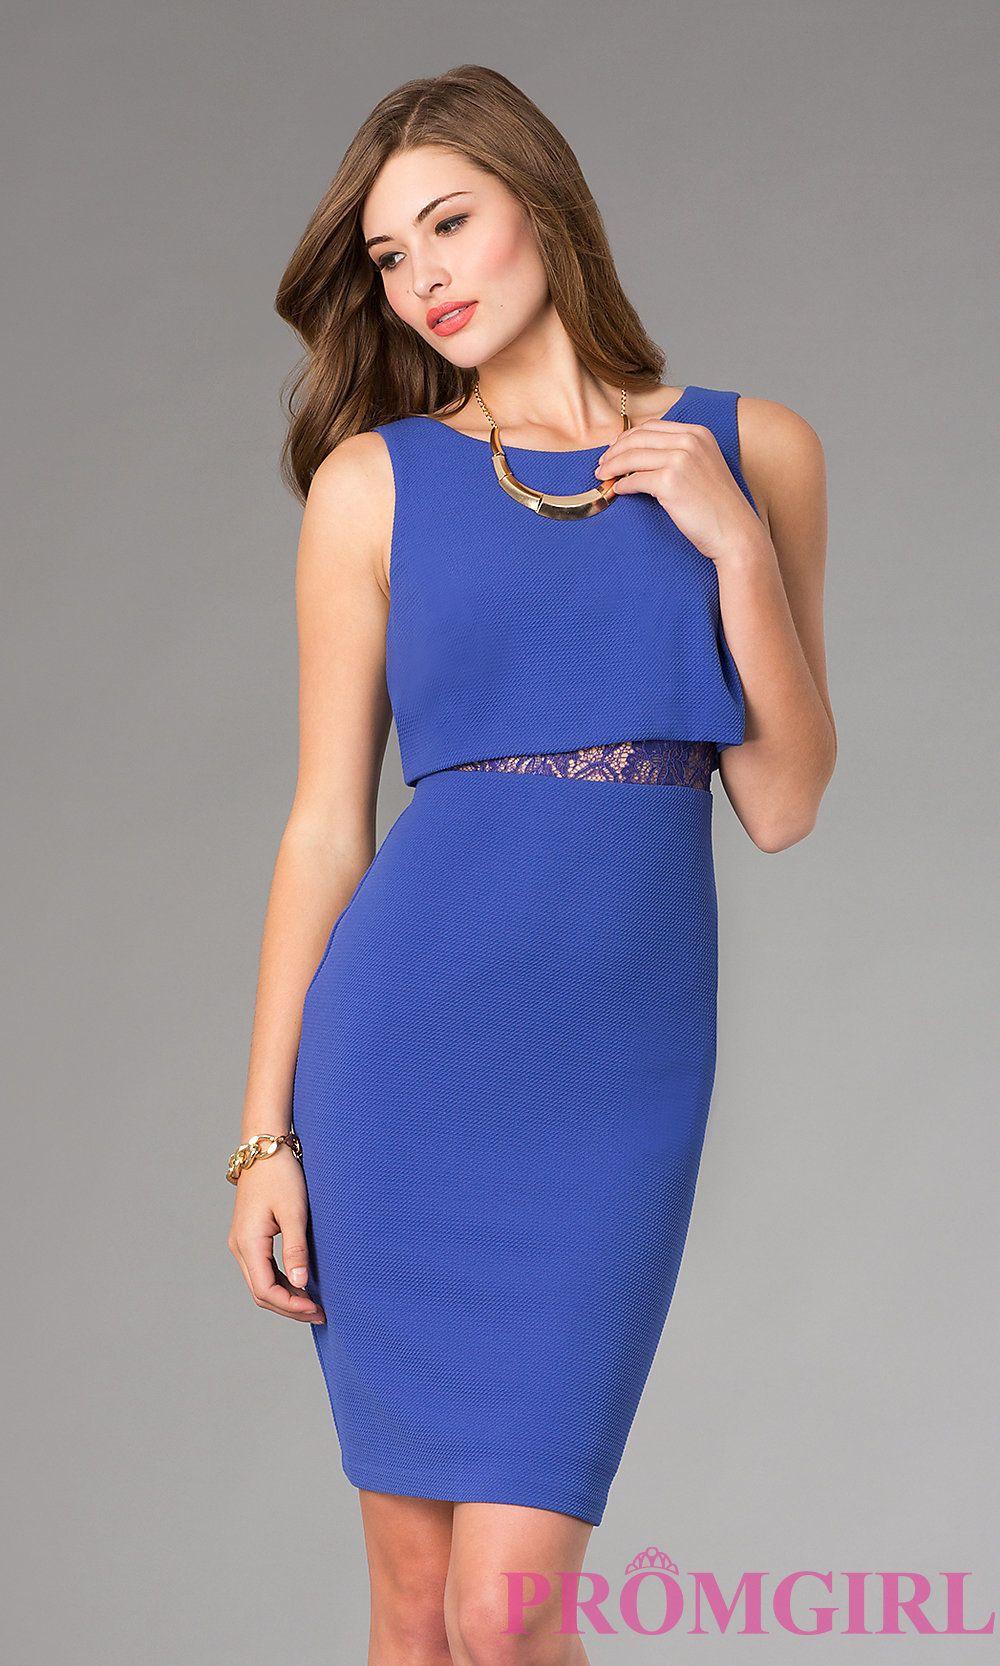 swatch_attribute_558702 | modern | Pinterest | Homecoming dresses ...